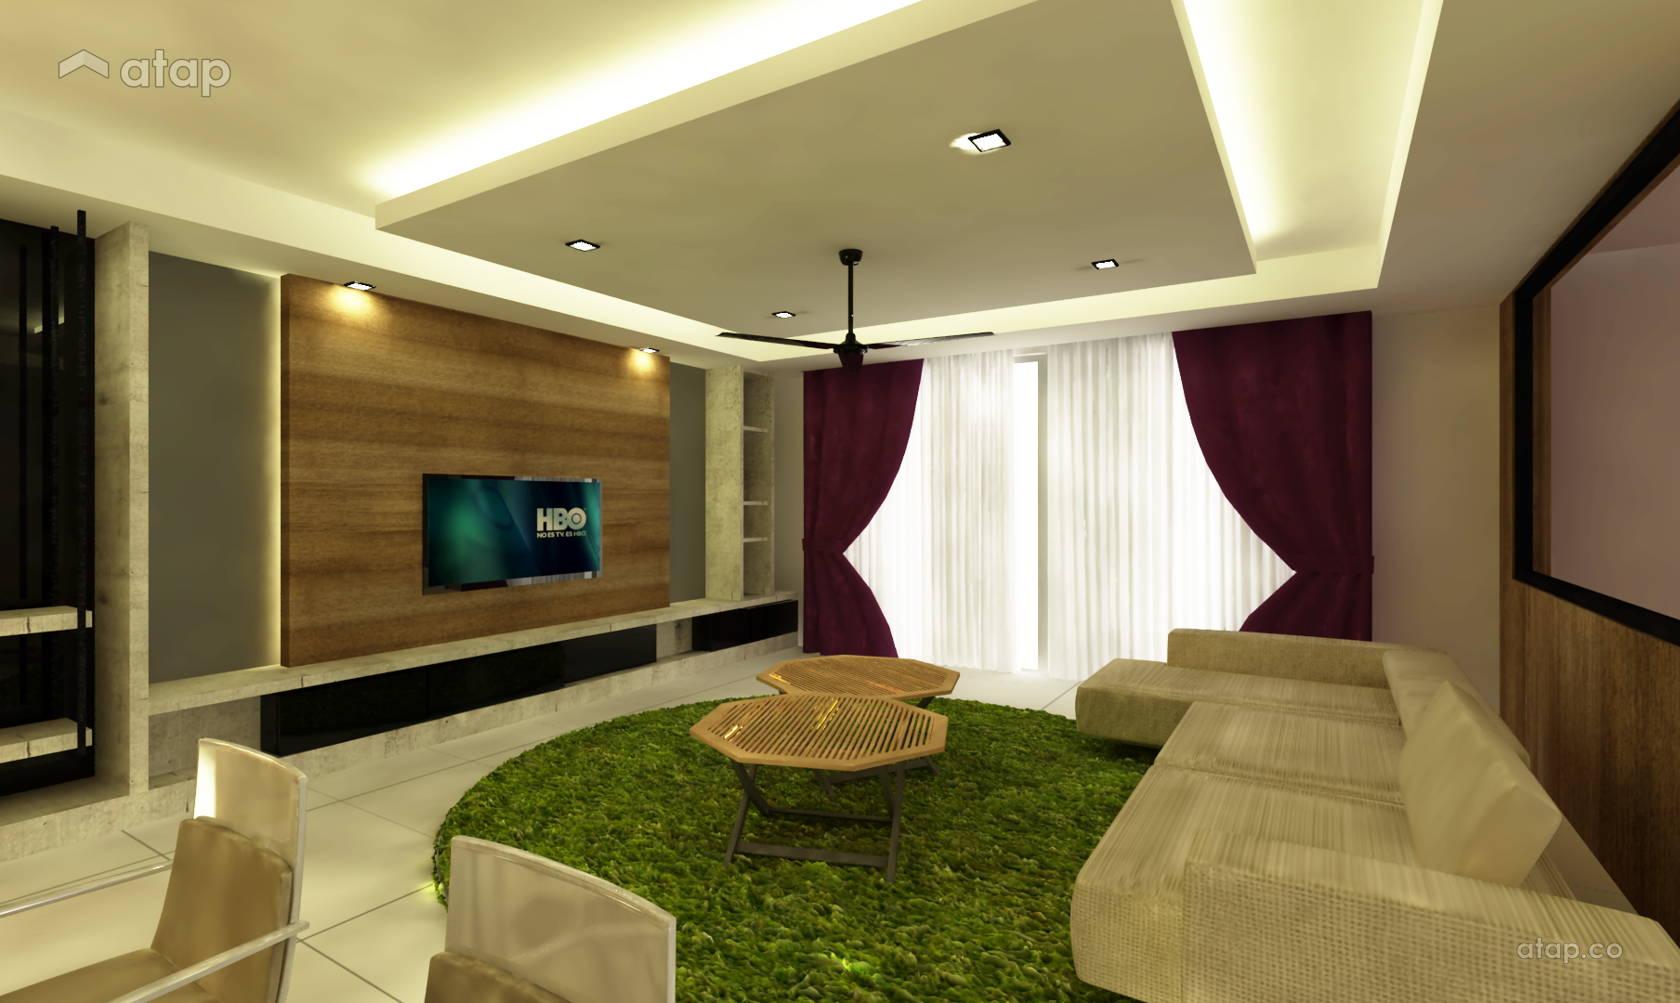 Cyberjaya Condo interior design renovation ideas, photos and price ...